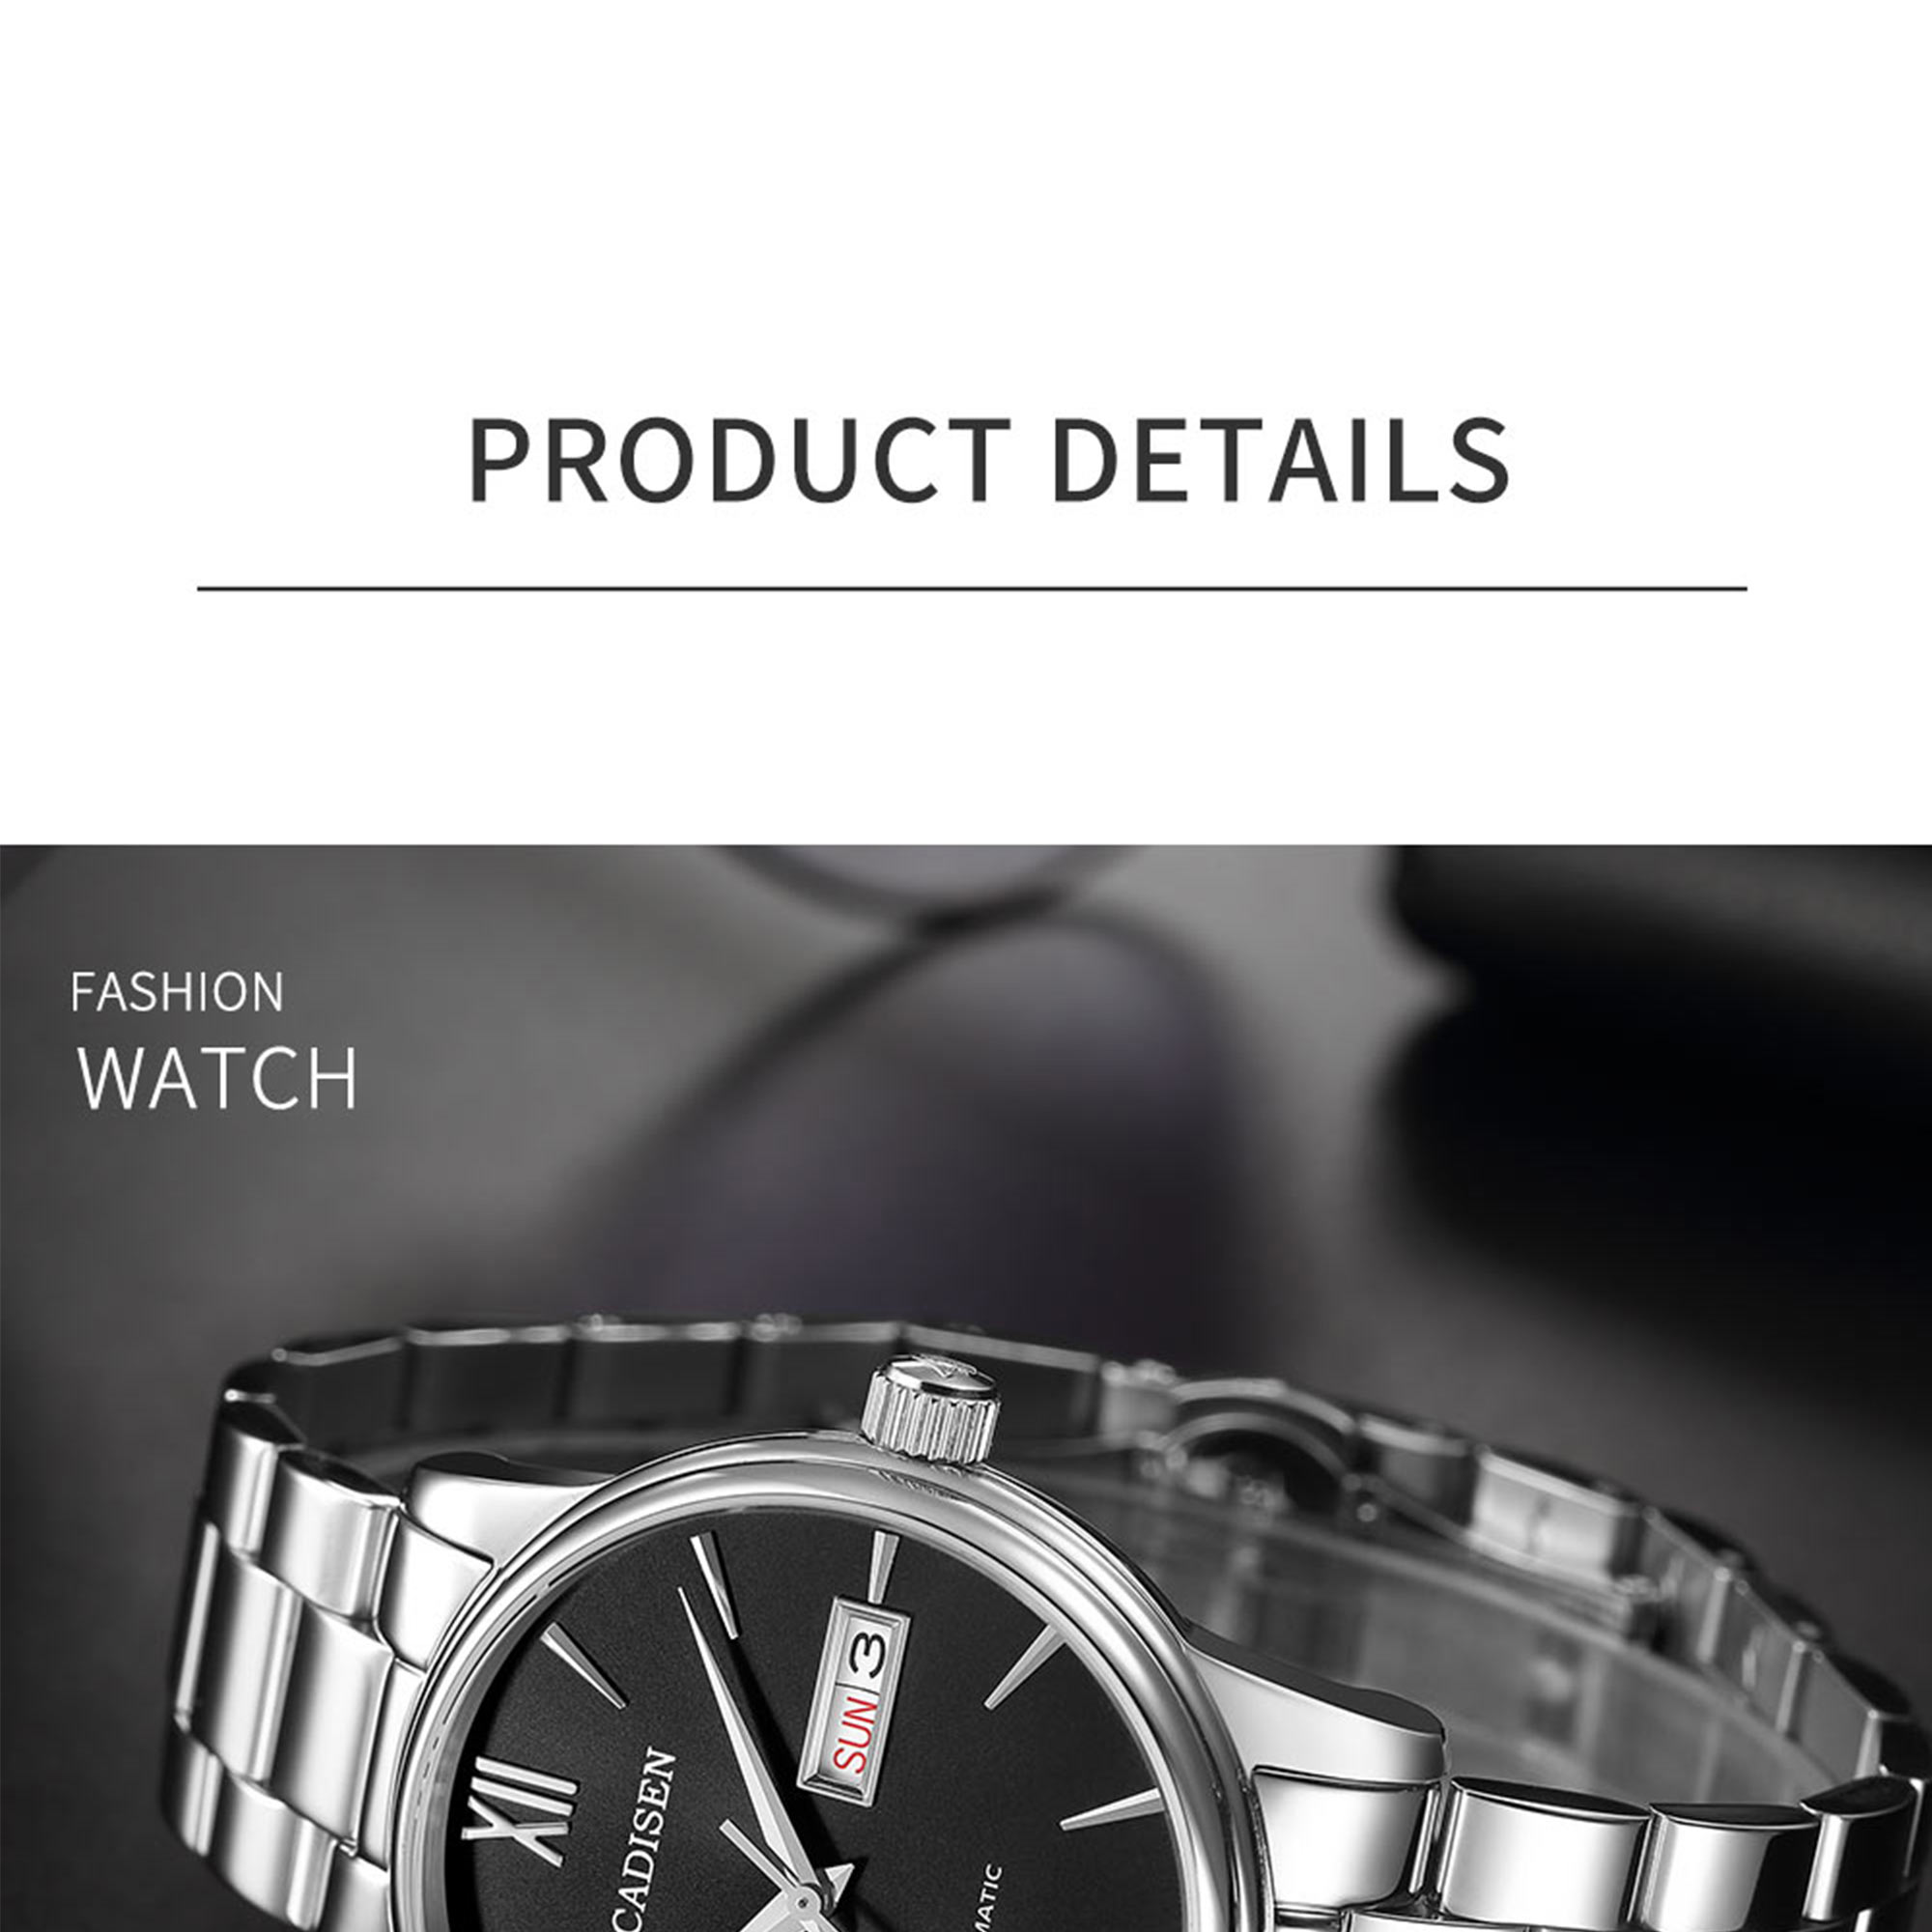 He6c119b037a24204b6fa5f9a500d7bb06 CADISEN Men Watch Automatic Mechanical Watches Role Date Week Top Luxury Brand Japan NH36A Wrist watch Clock Relogio Masculino